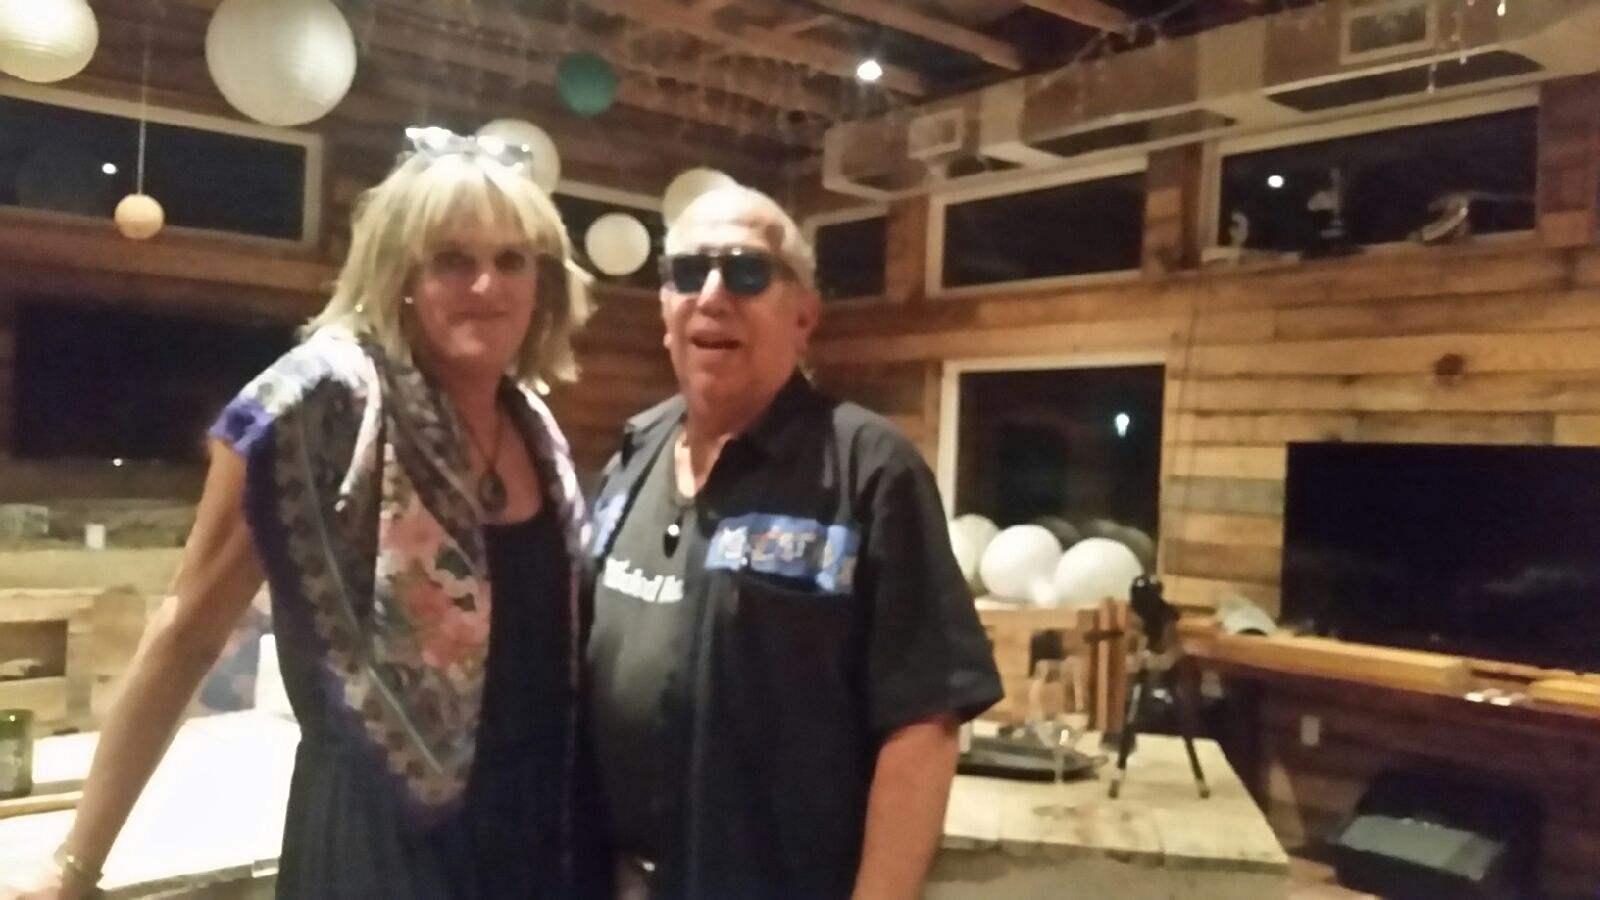 Teebs, NPC President & Art Mendoza, Local Music Genius